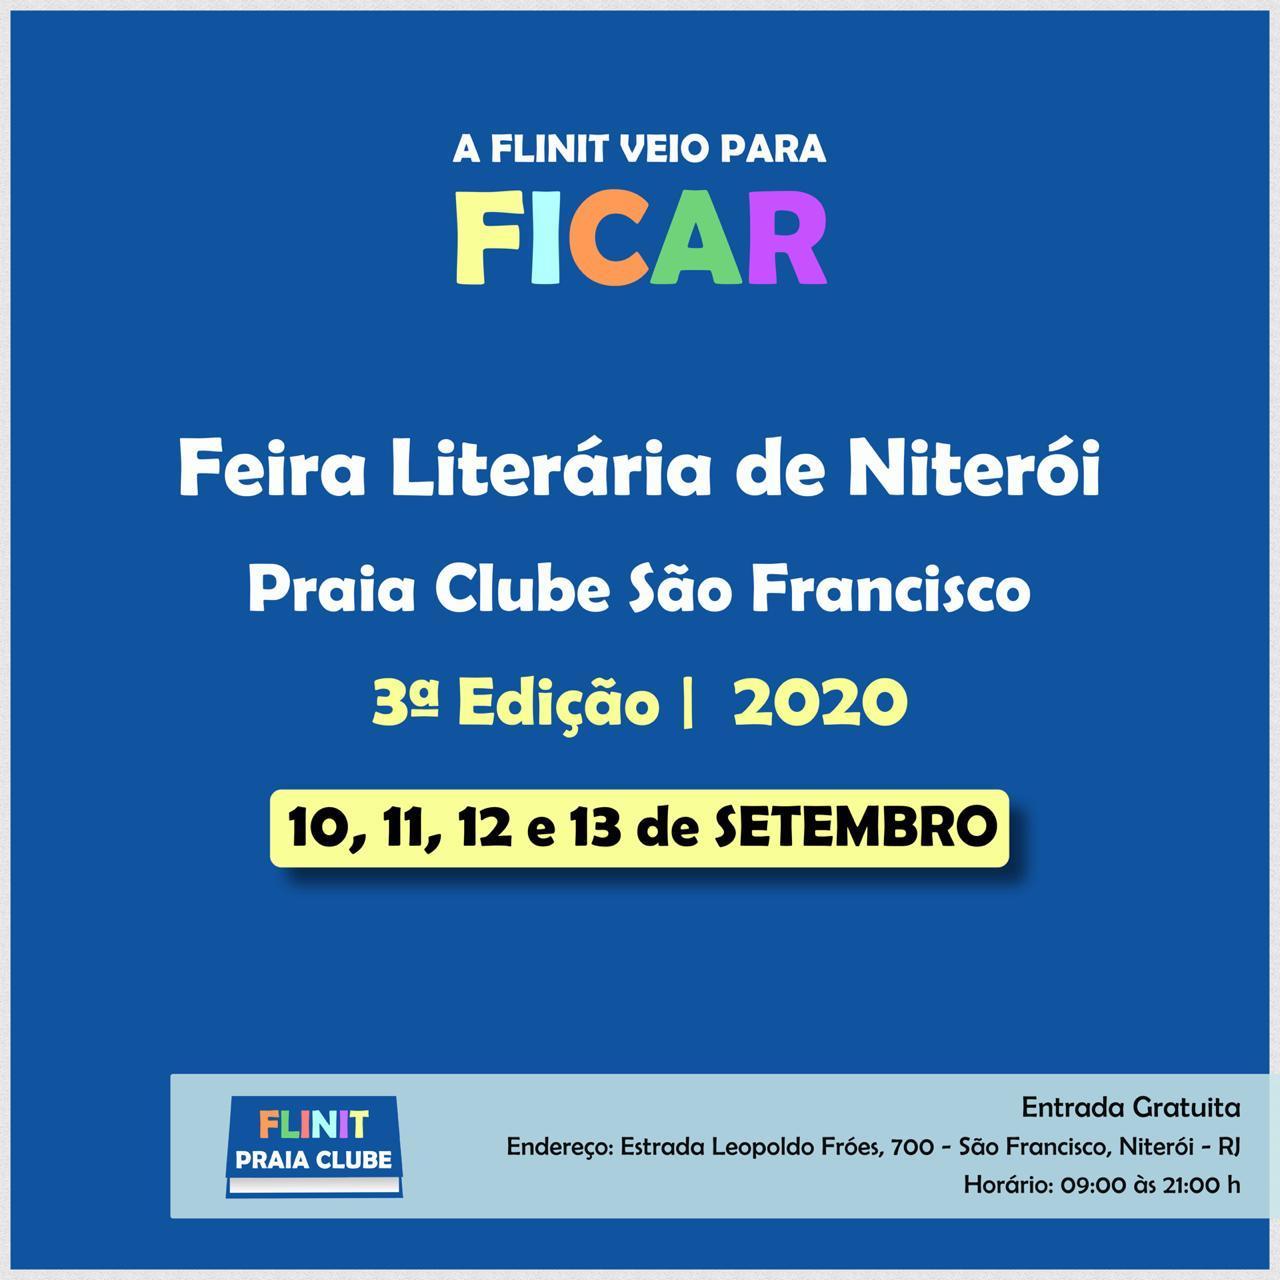 Feira Literária de Niterói Praia Clube São Francisco